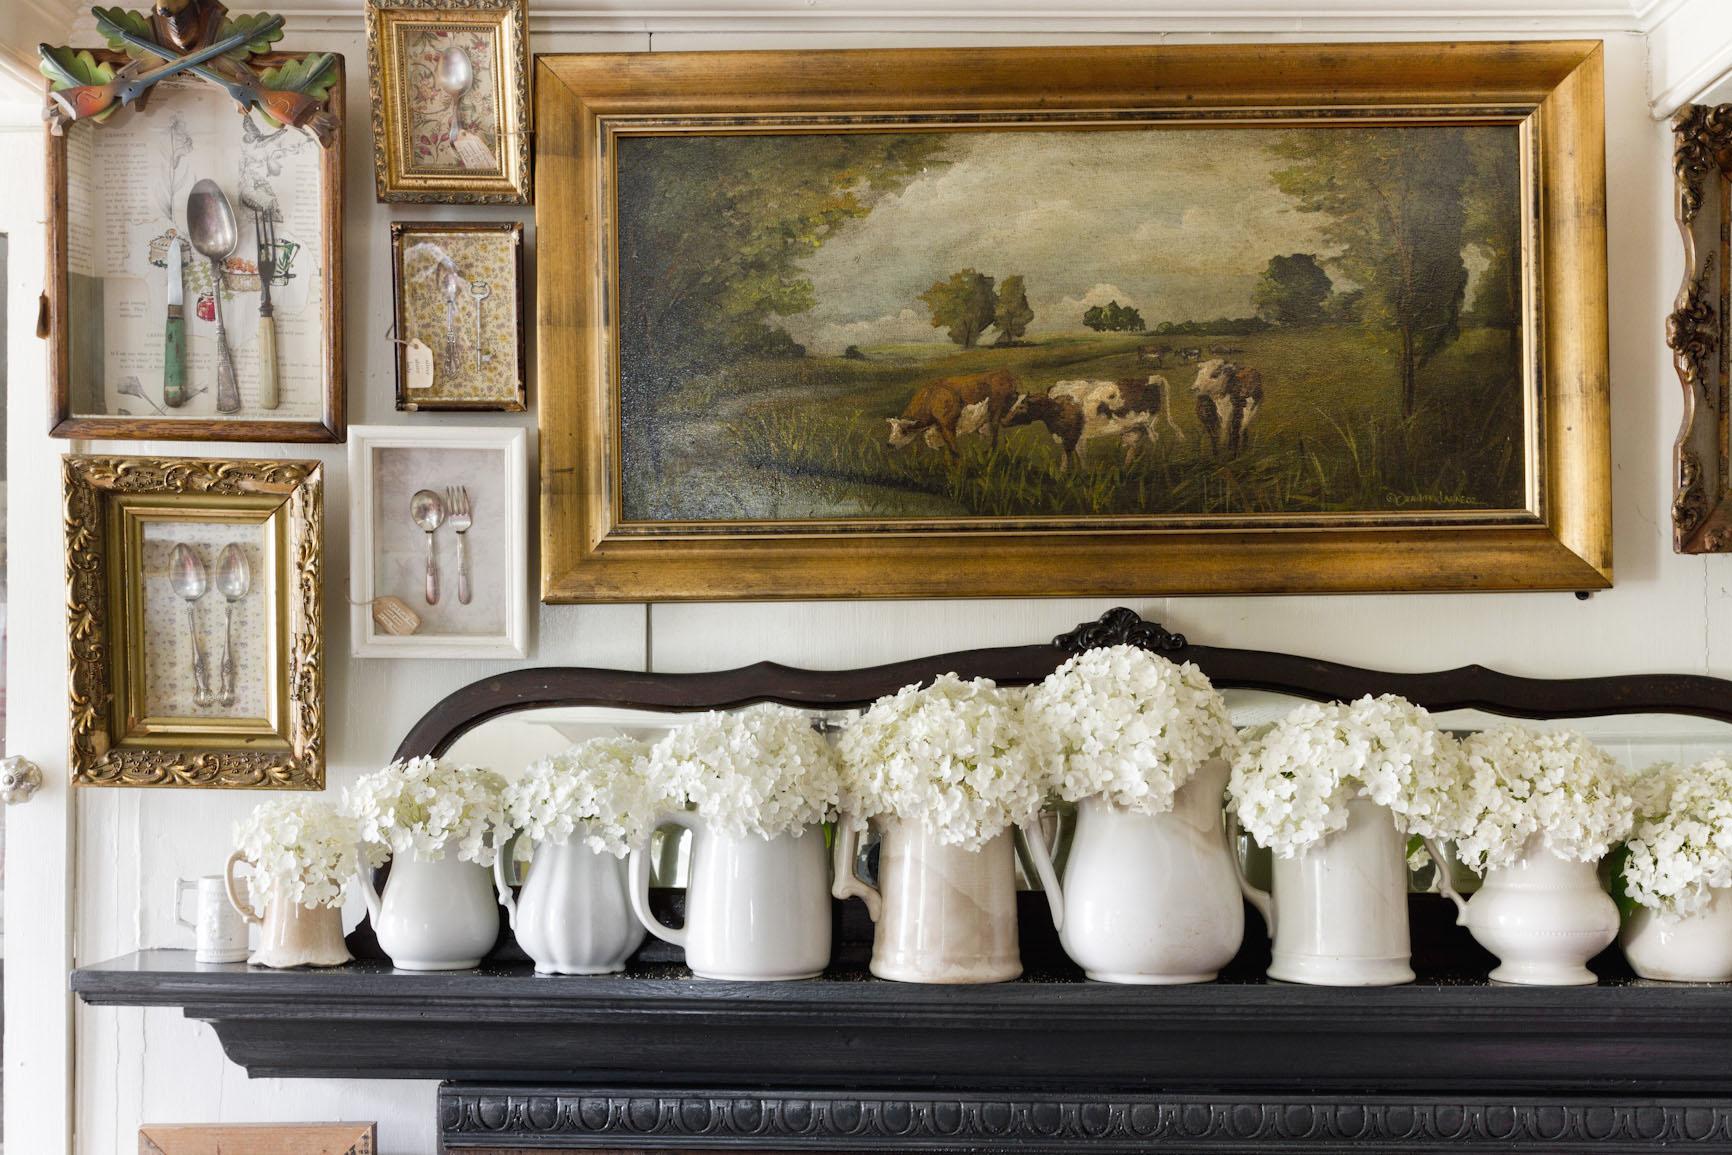 rustic-farmhouse-hydrangeas-white-pitchers-mantle-interior-photography.jpg